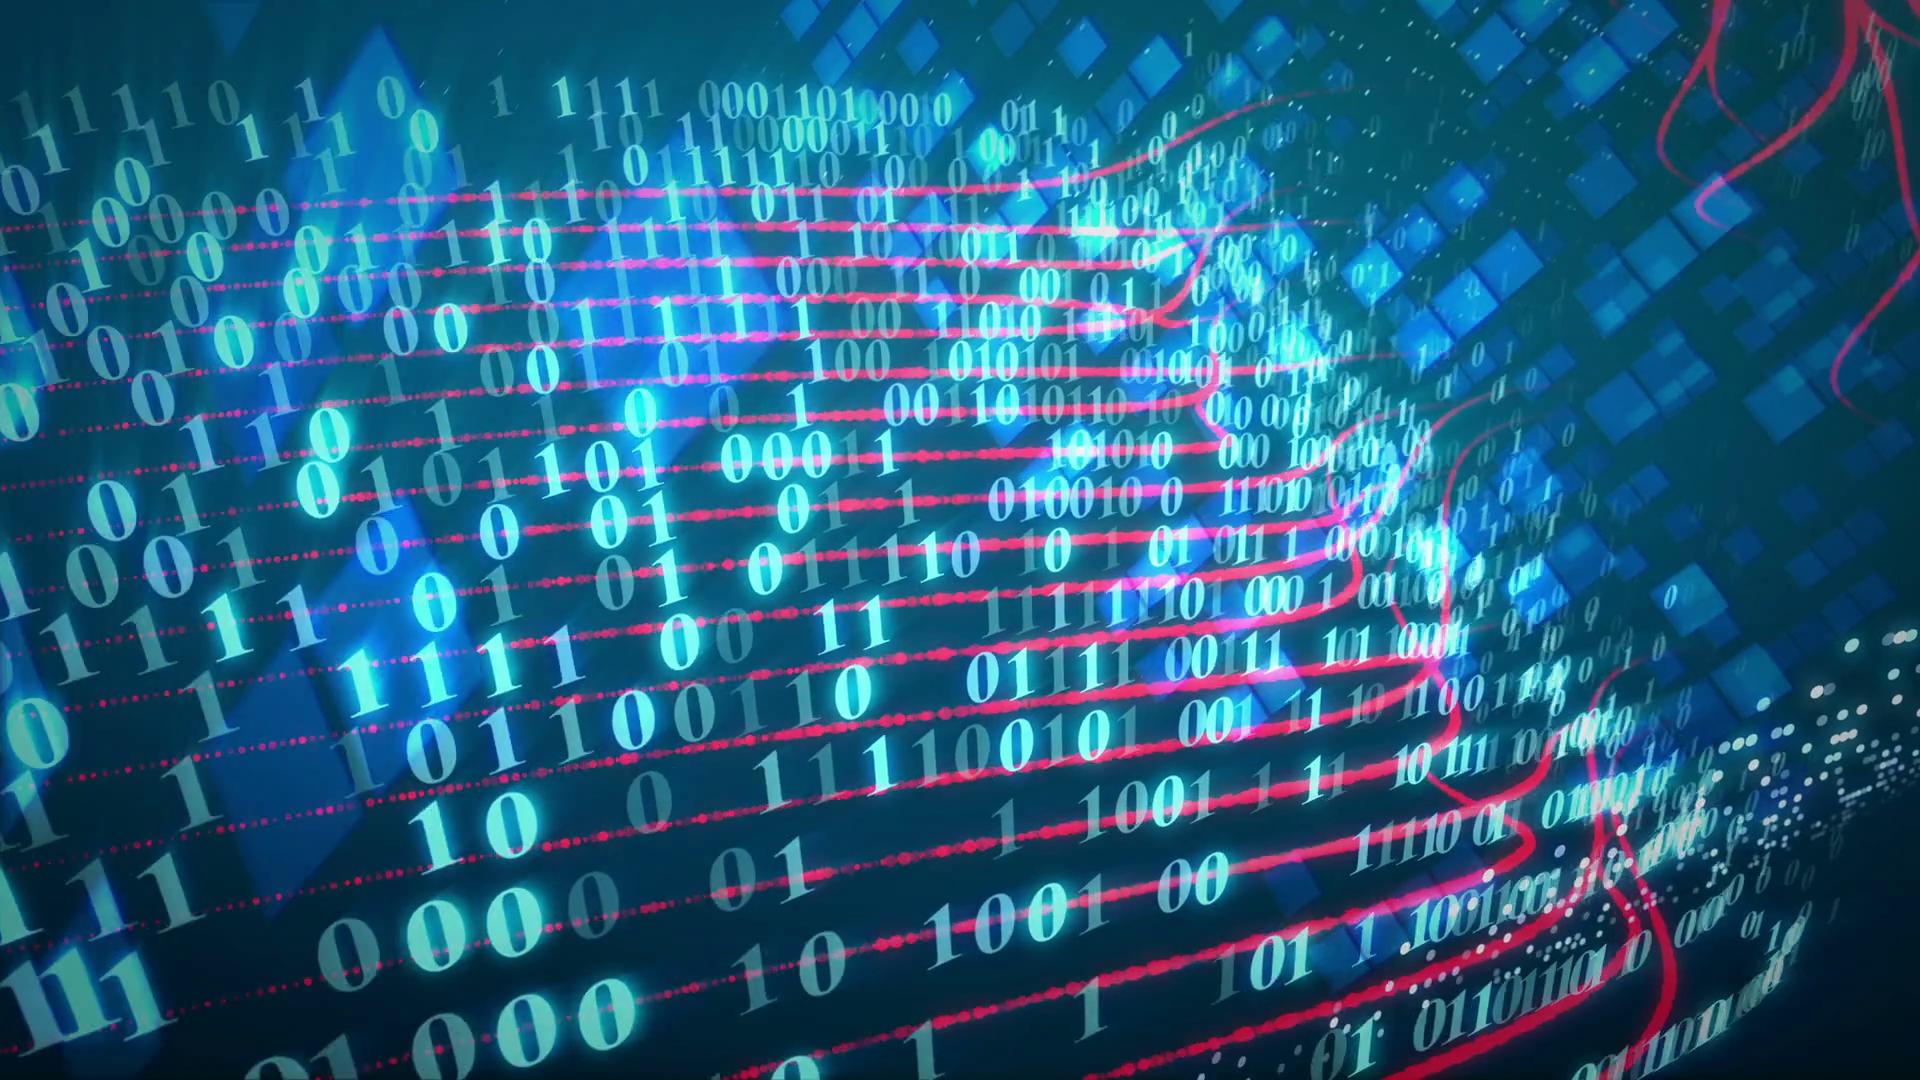 How long has binary code options been around